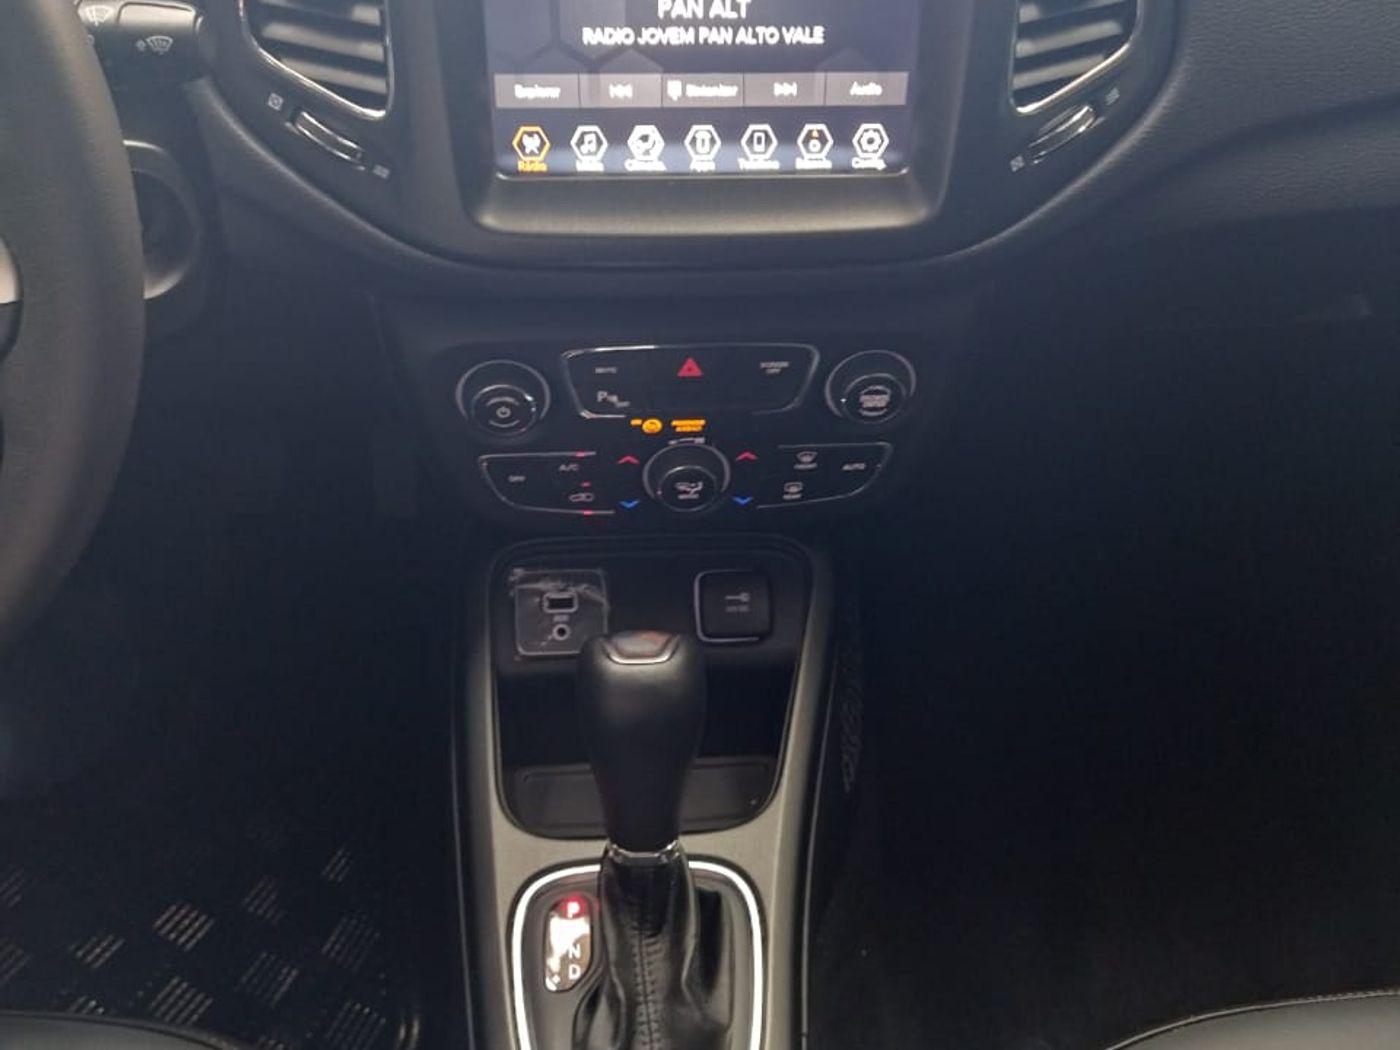 Jeep COMPASS LONGITUDE 2.0 4x2 Flex 16V Aut.